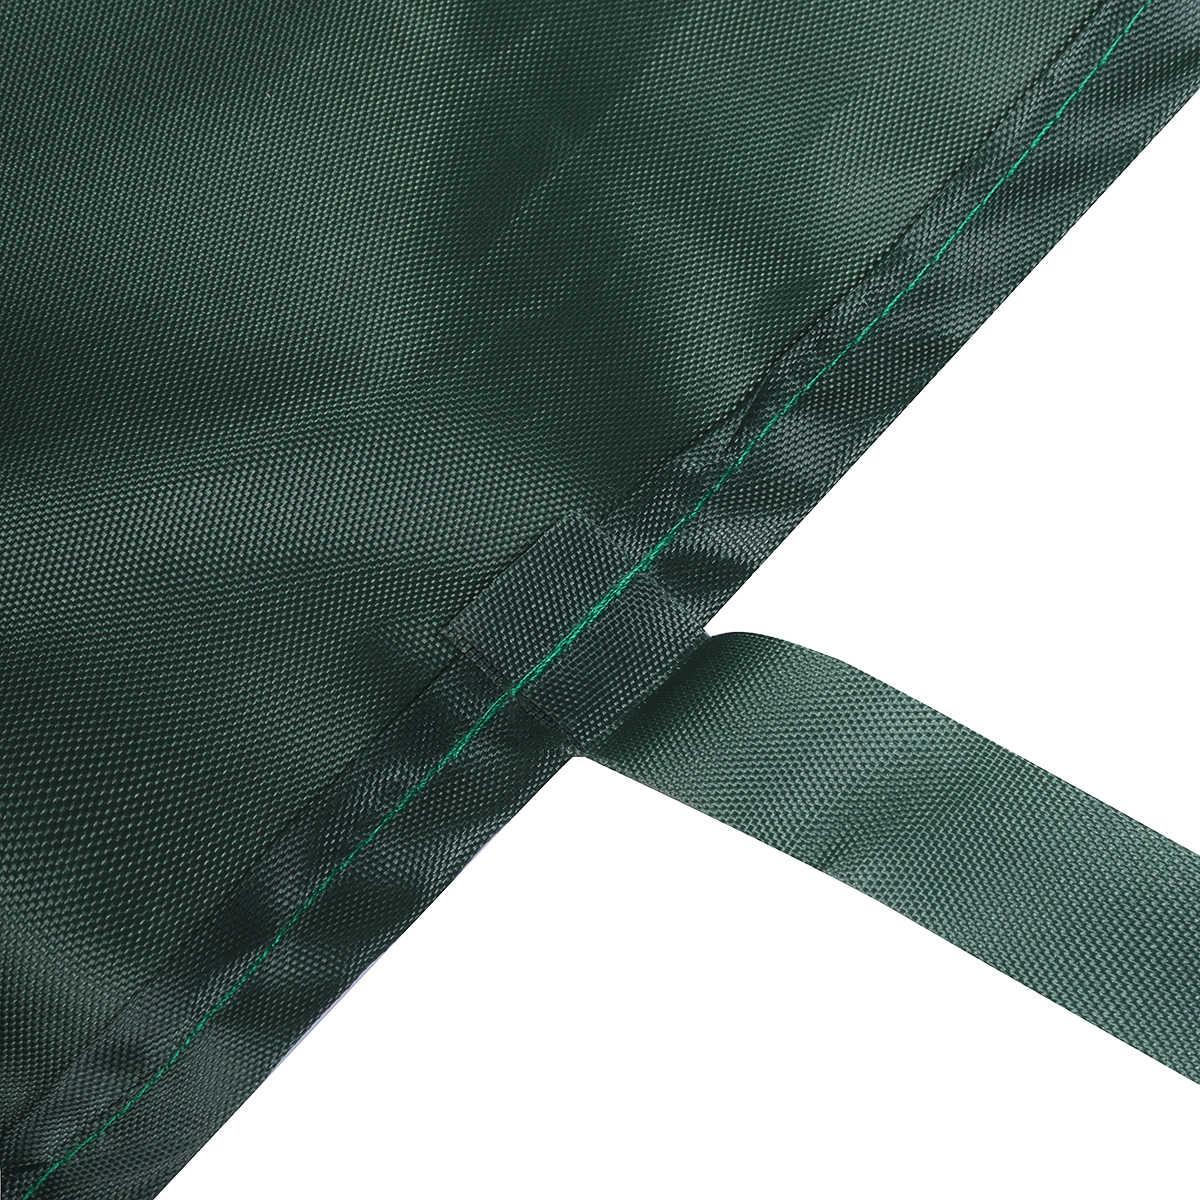 Зеленый 5 размеров патио тент сумка для хранения зимние чулки с мотивом дождливой погоды, Cover Protector солнцезащитный навес, тент Водонепроницаемый Защита от солнца